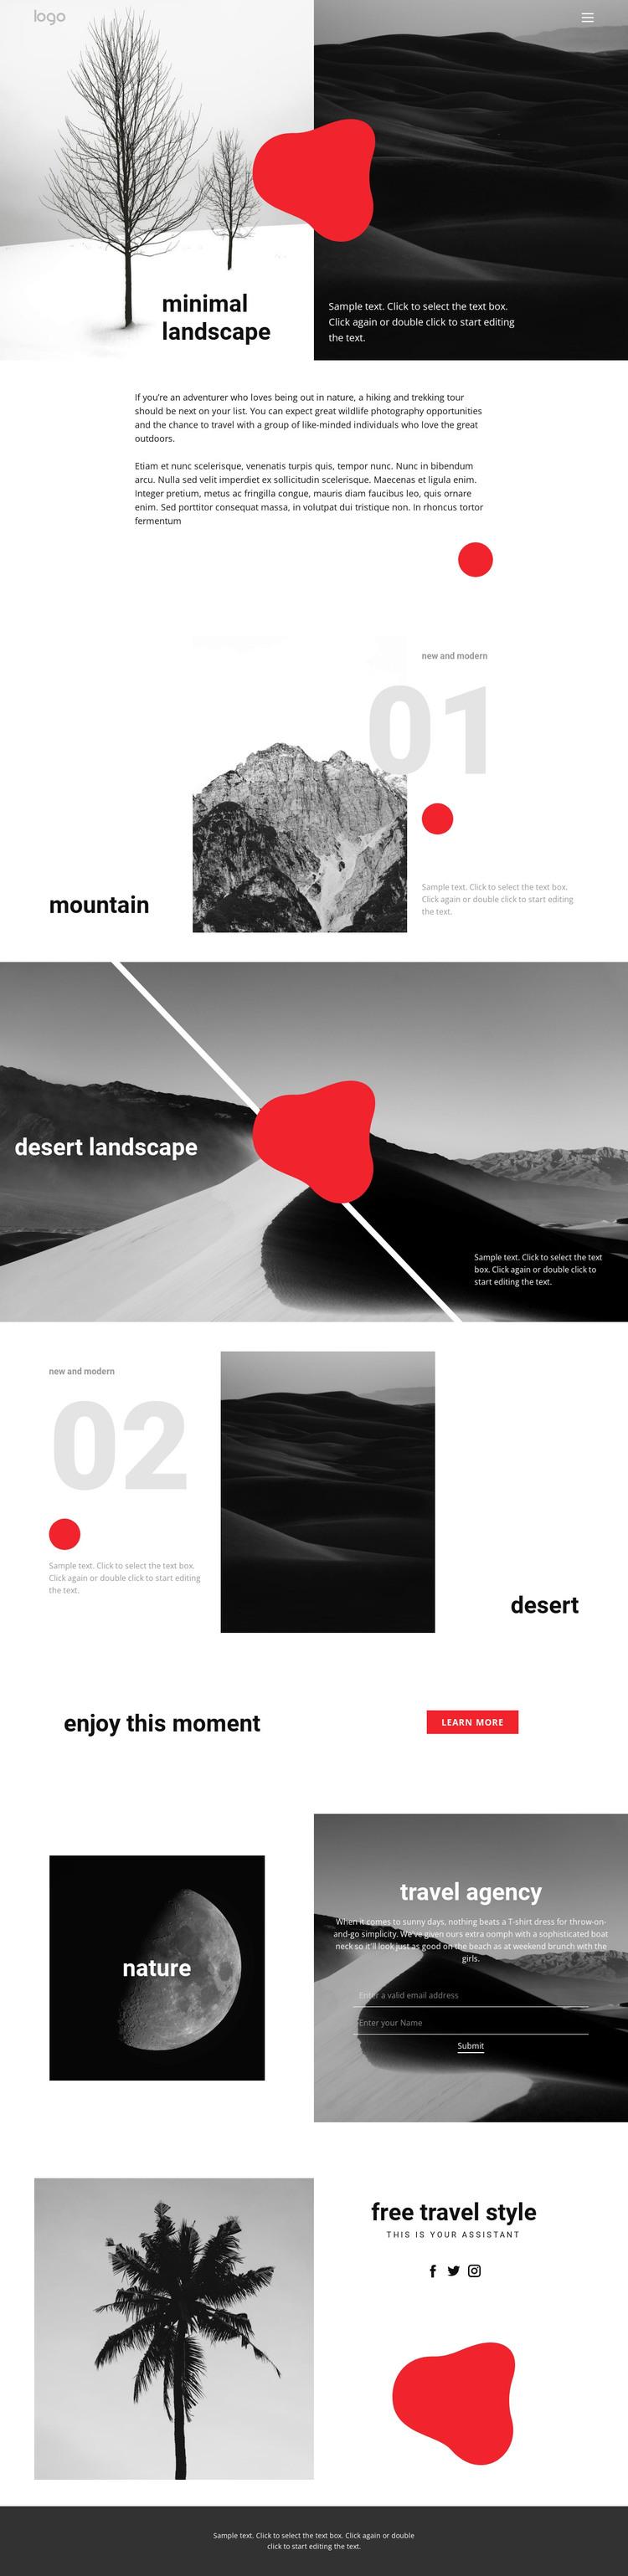 Minimal landscape photo WordPress Theme